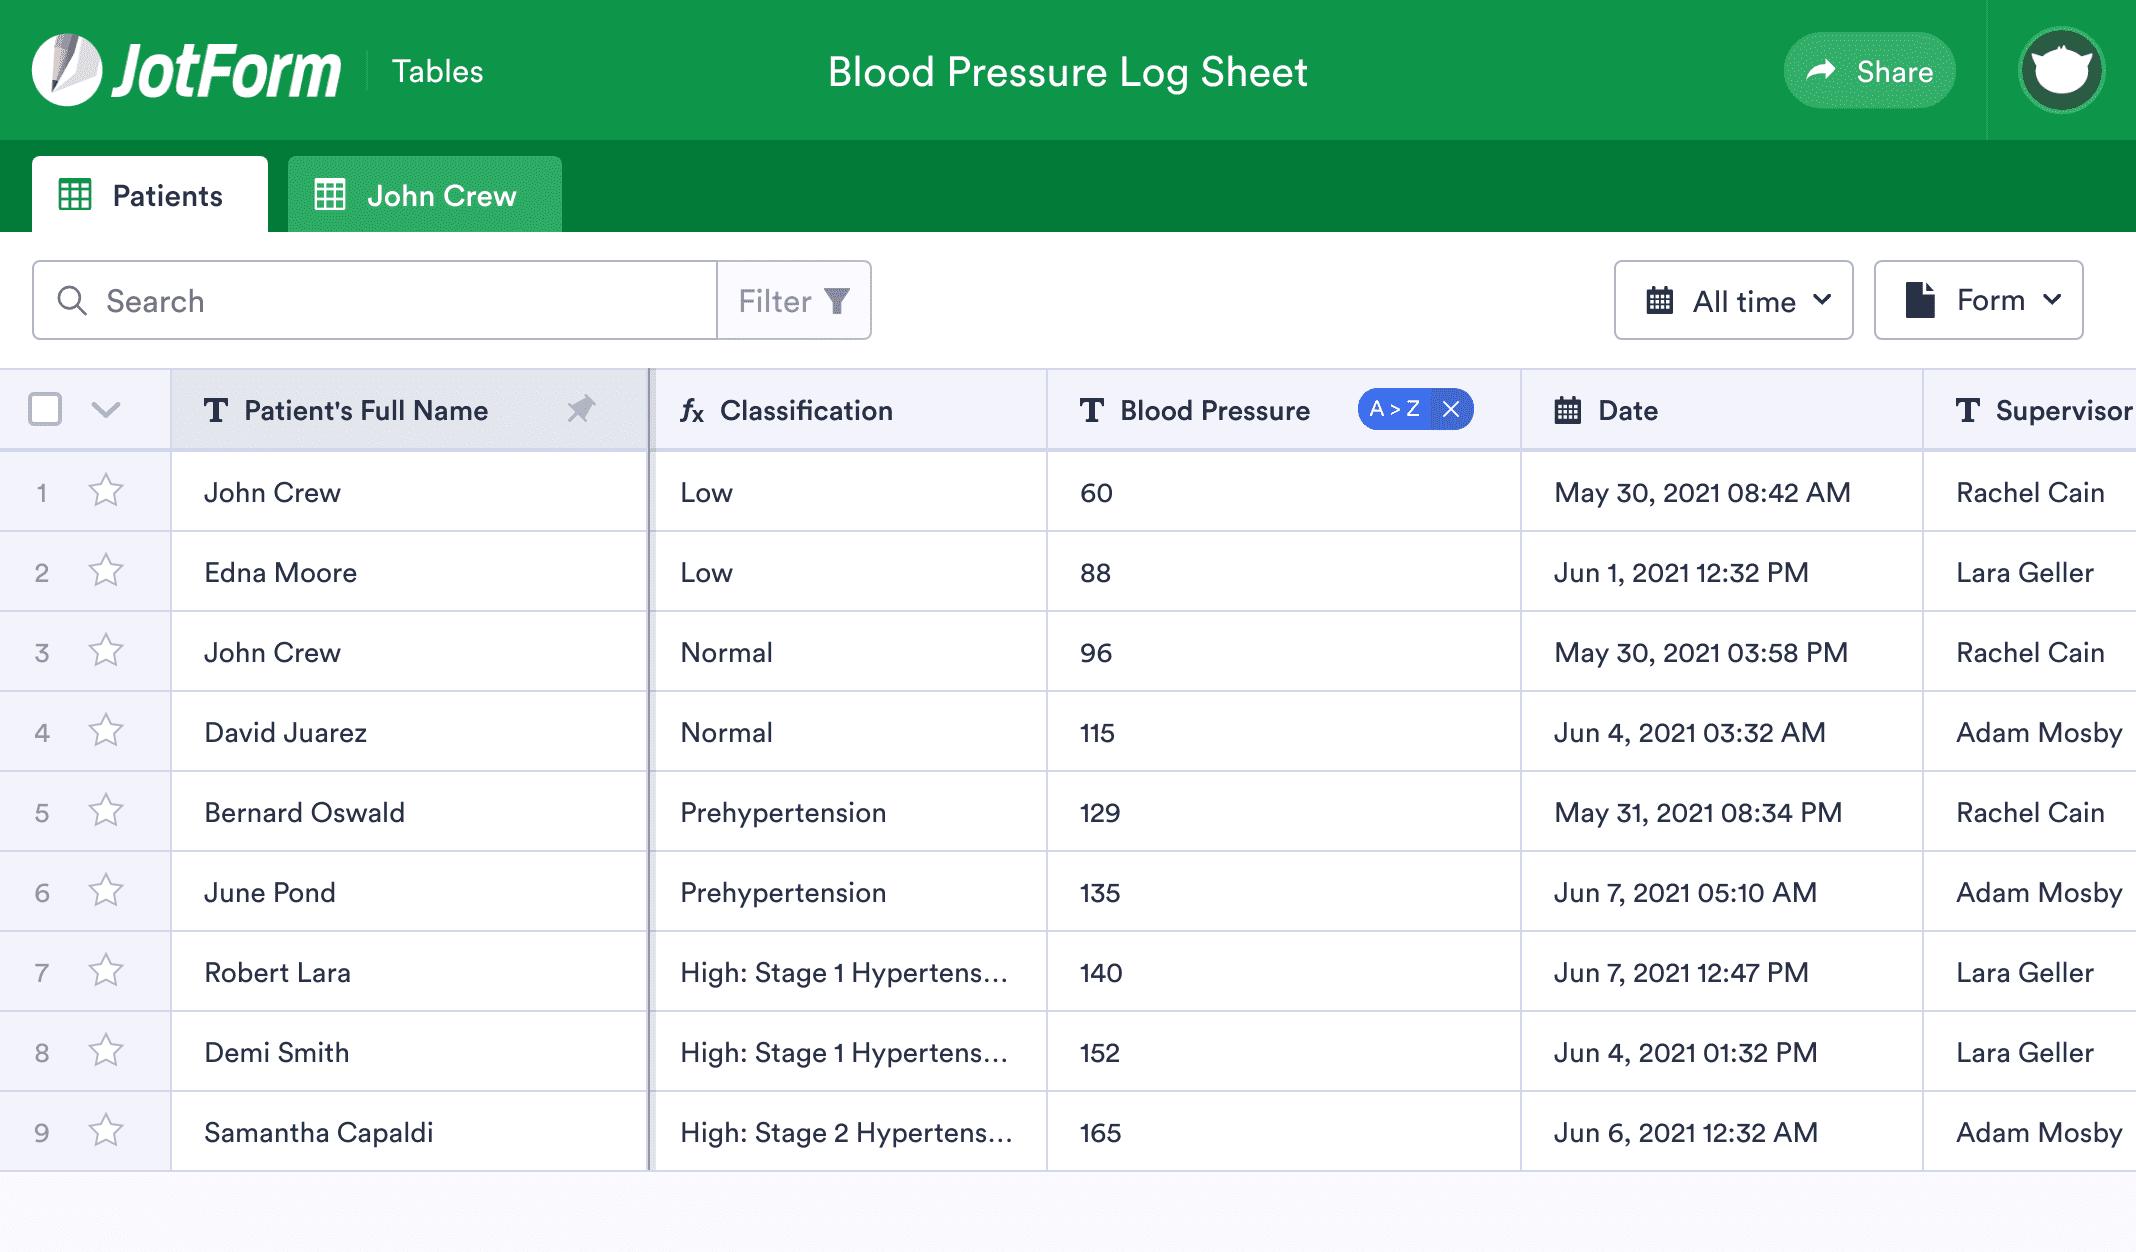 Blood Pressure Log Sheet